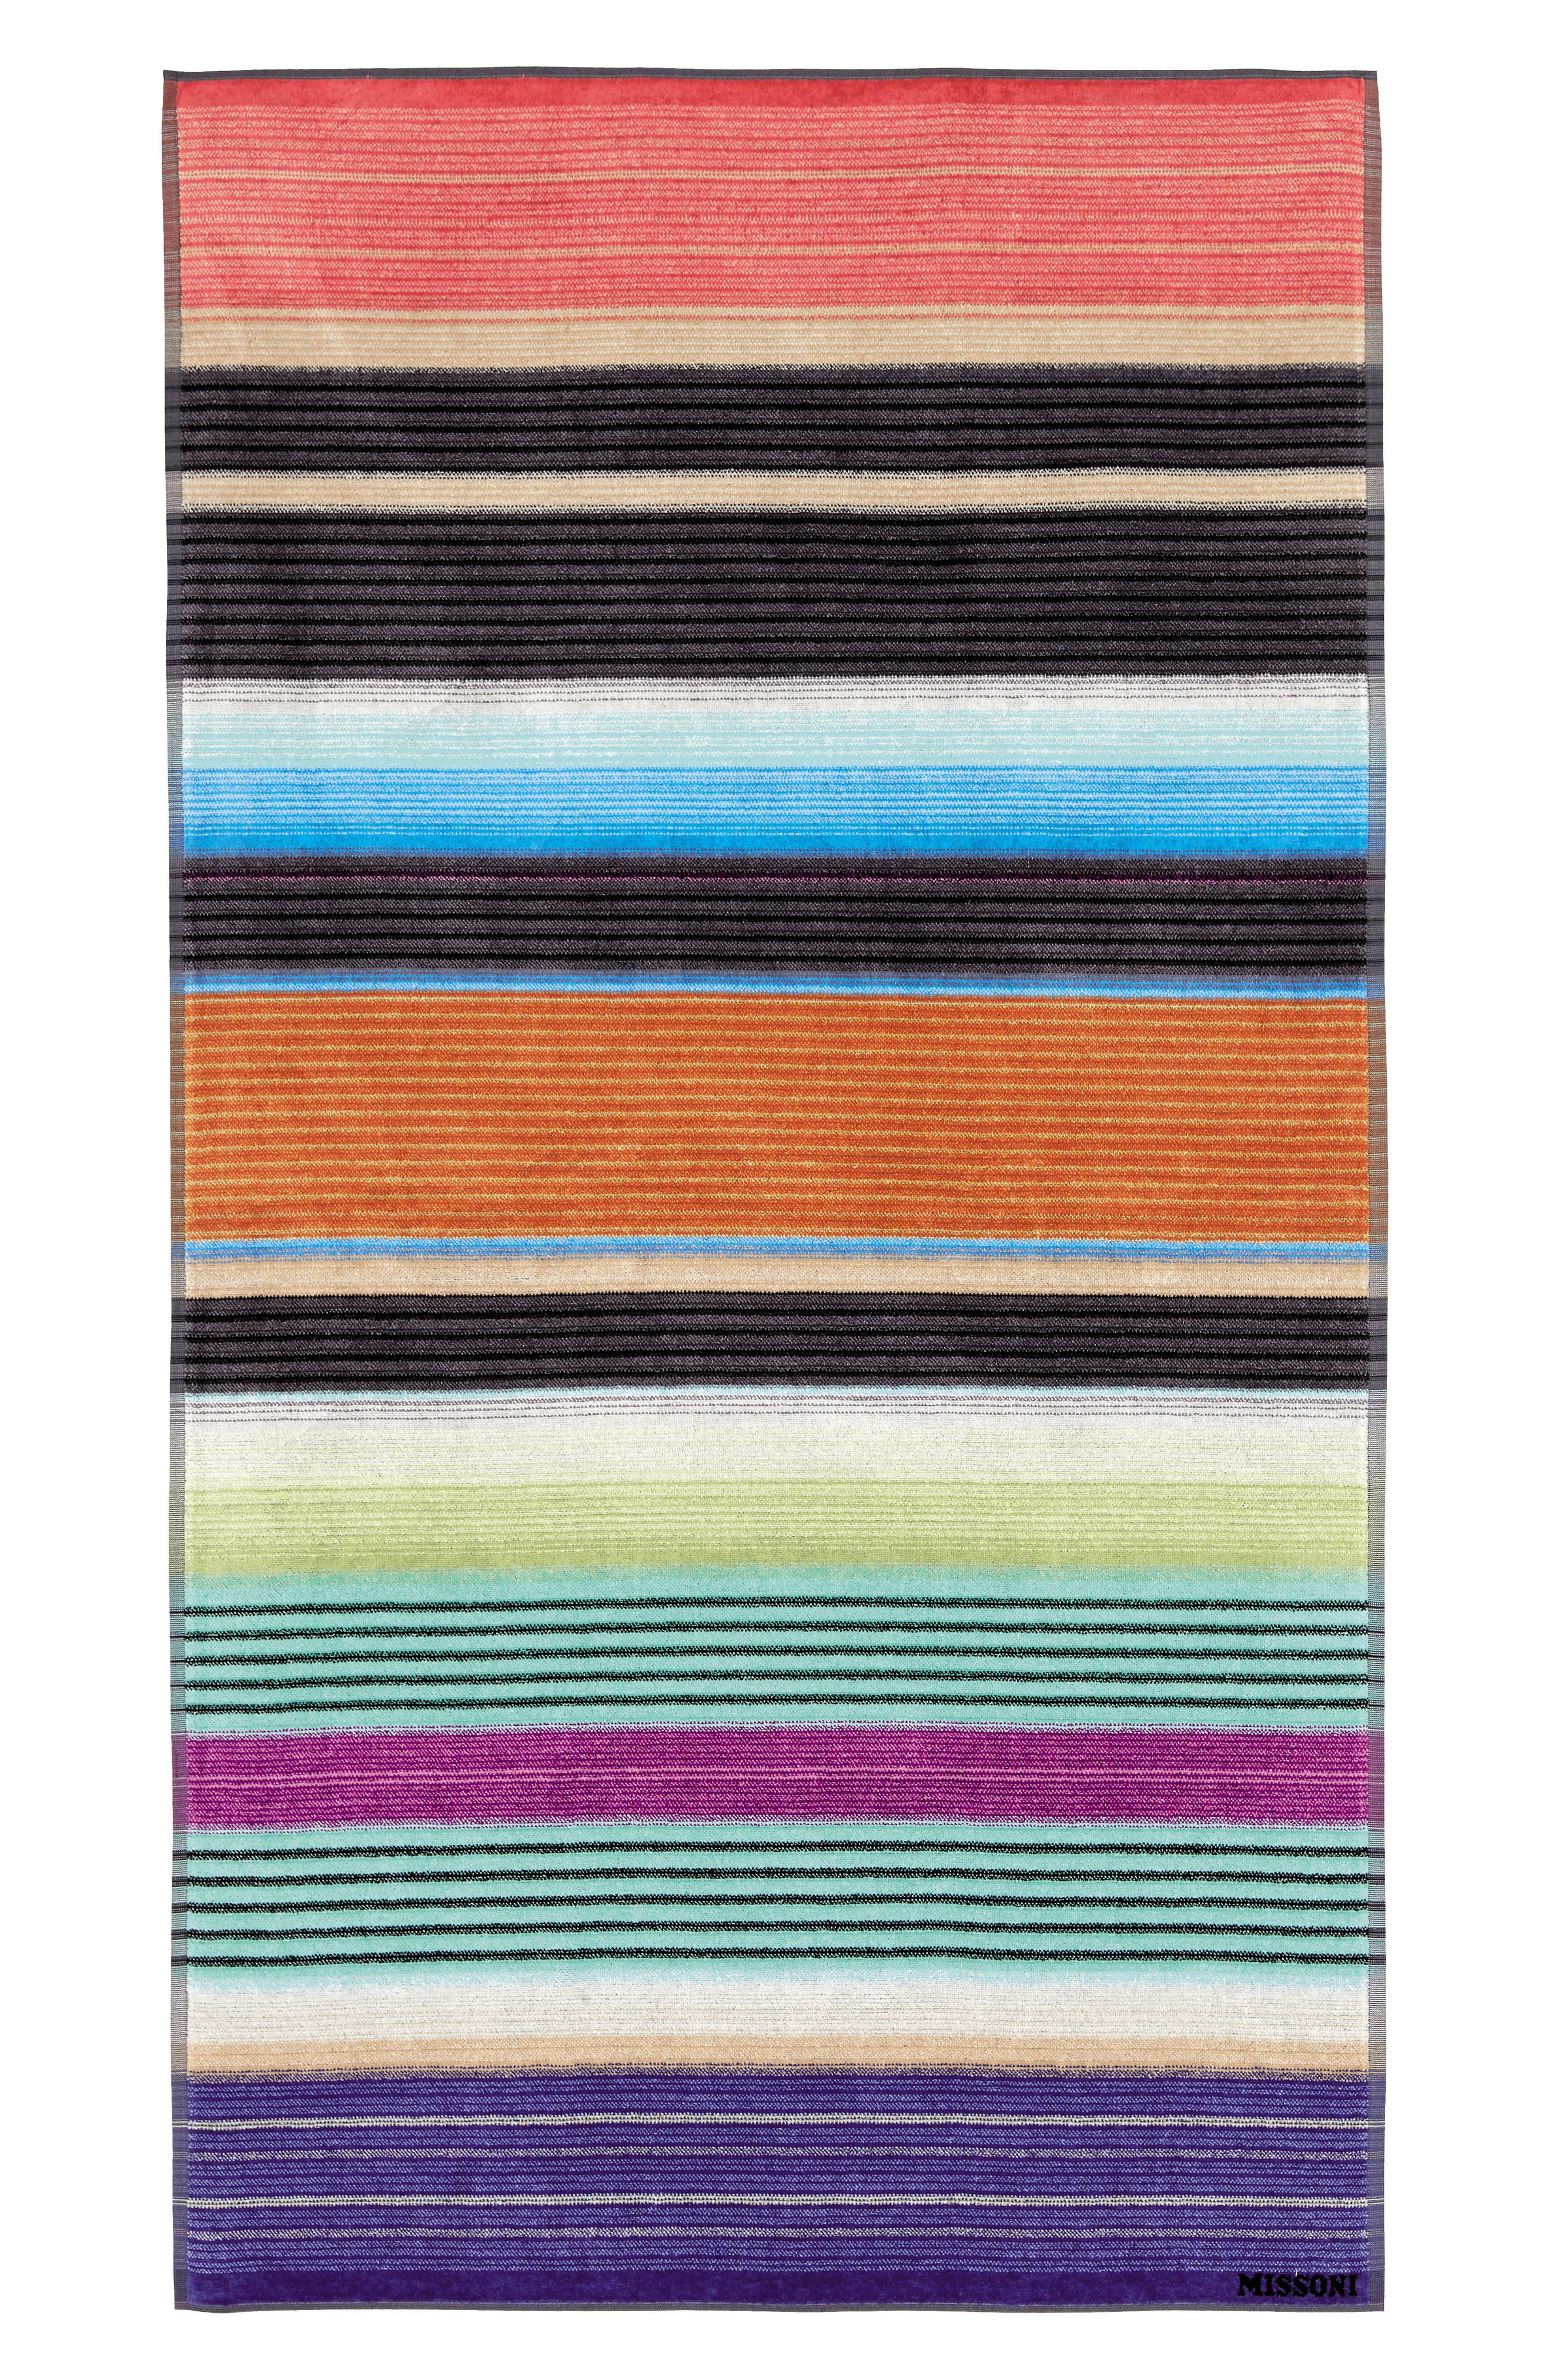 Viviette Beach Towel,                         Main,                         color, MULTI